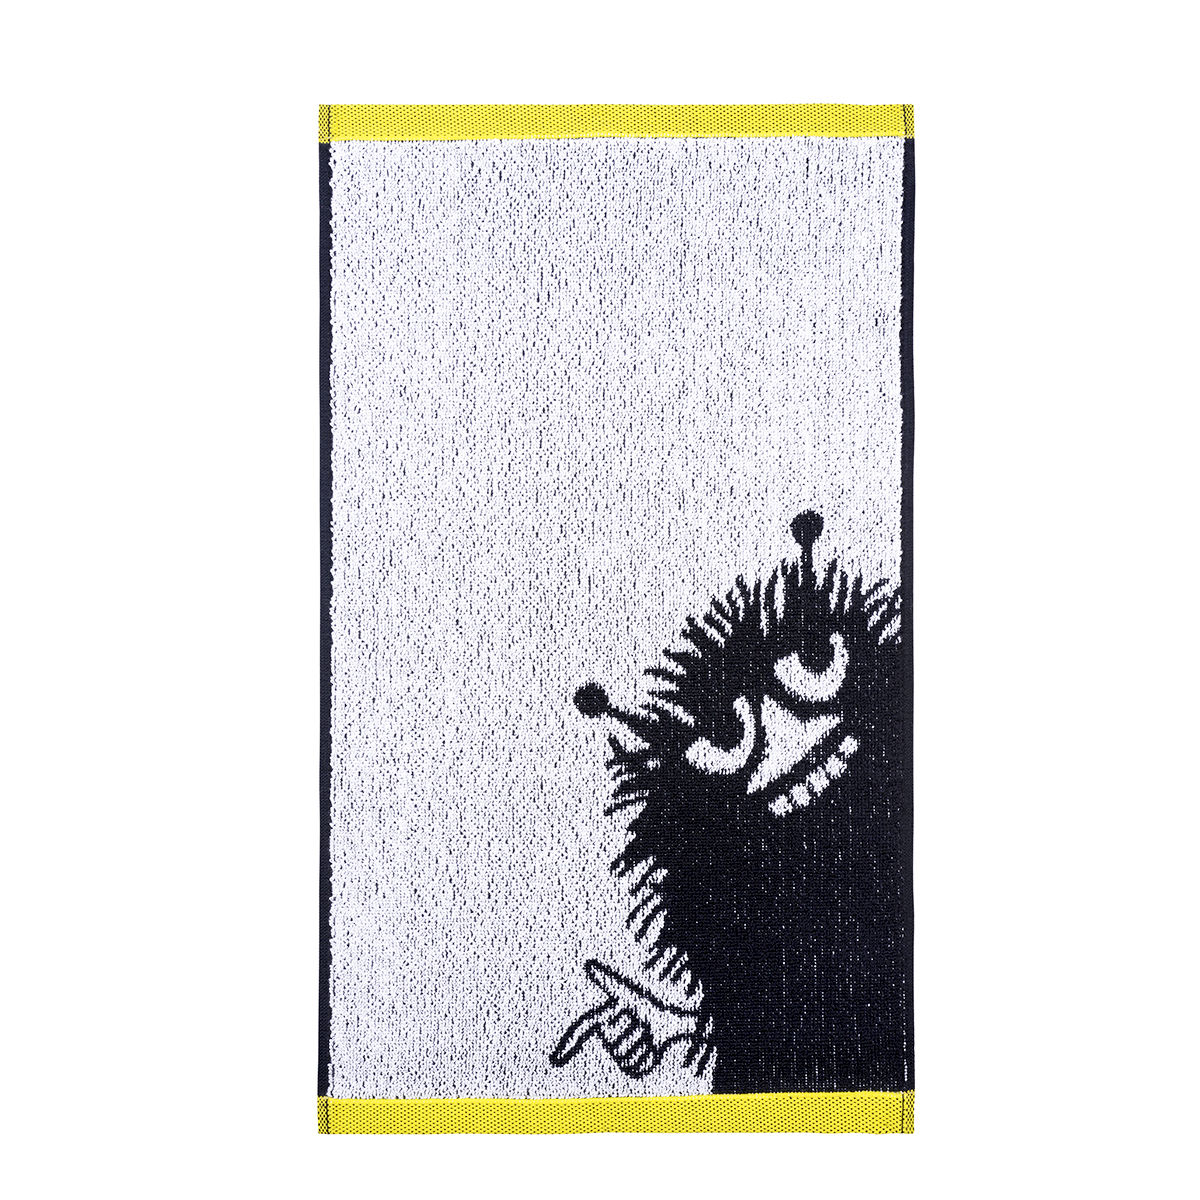 Stinky handduk svart/vit/gul, Finlayson